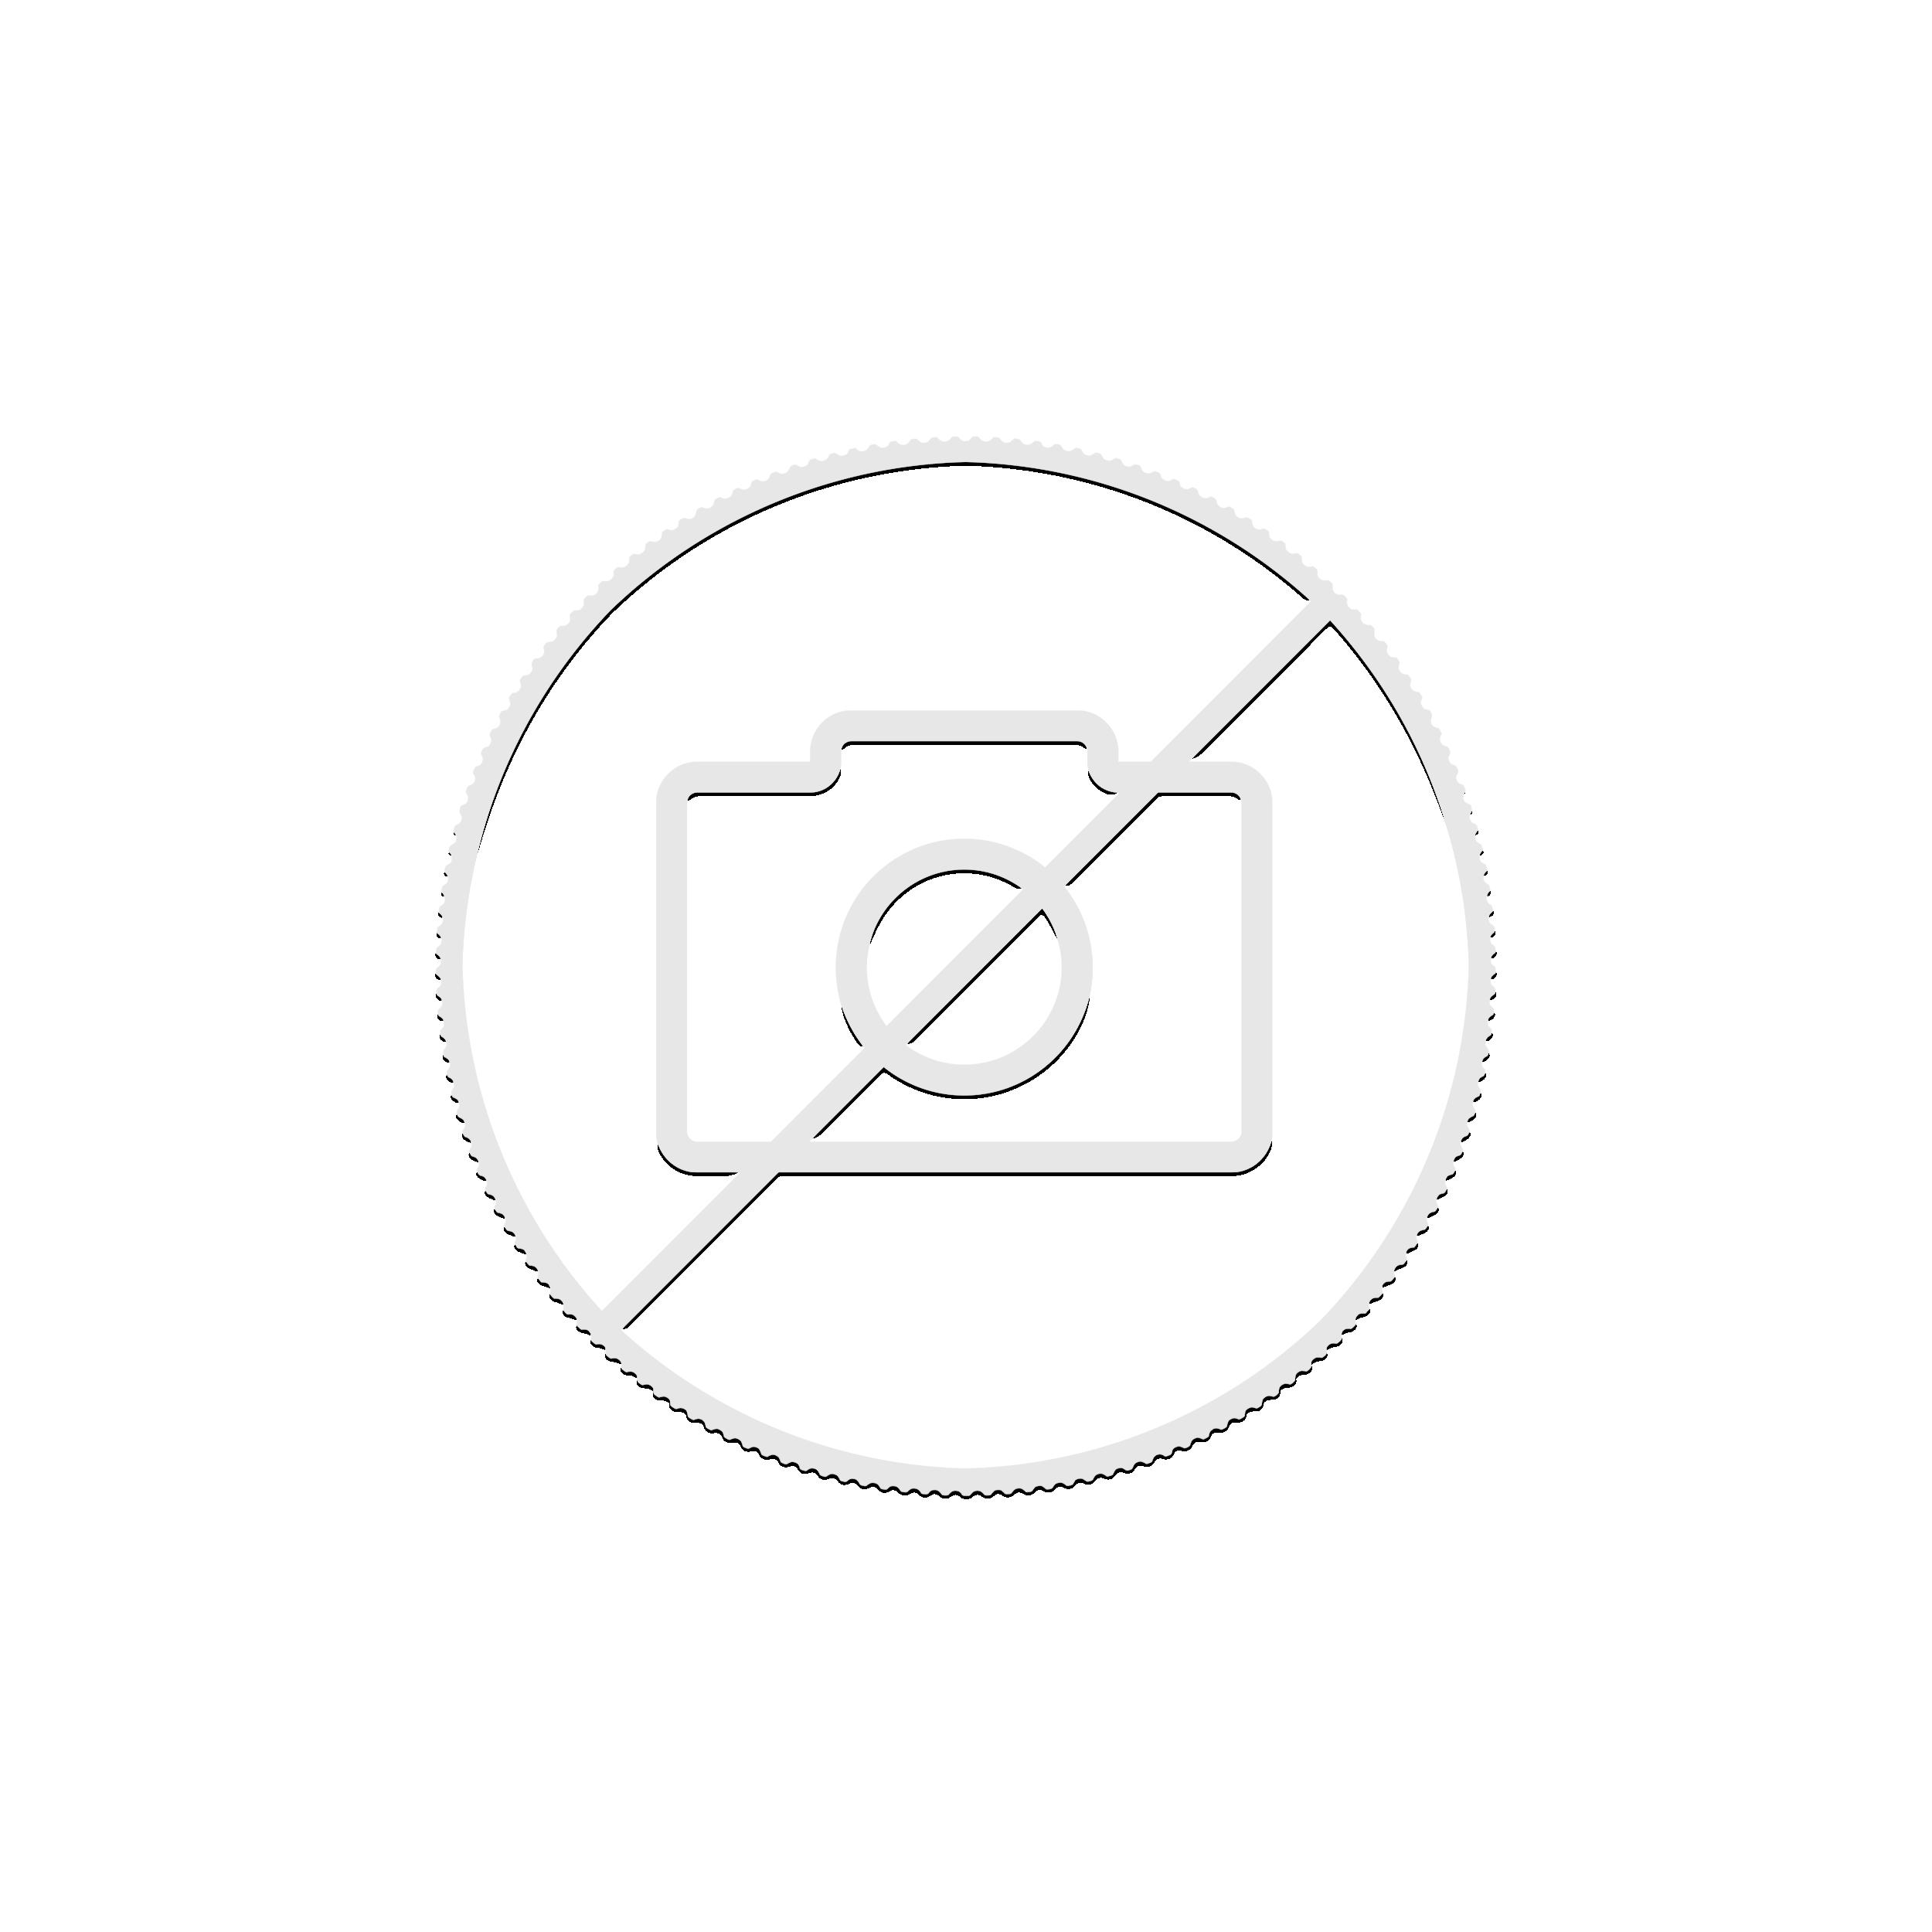 1 Troy ounce zilveren munt Golden Ring - Leopold 2019